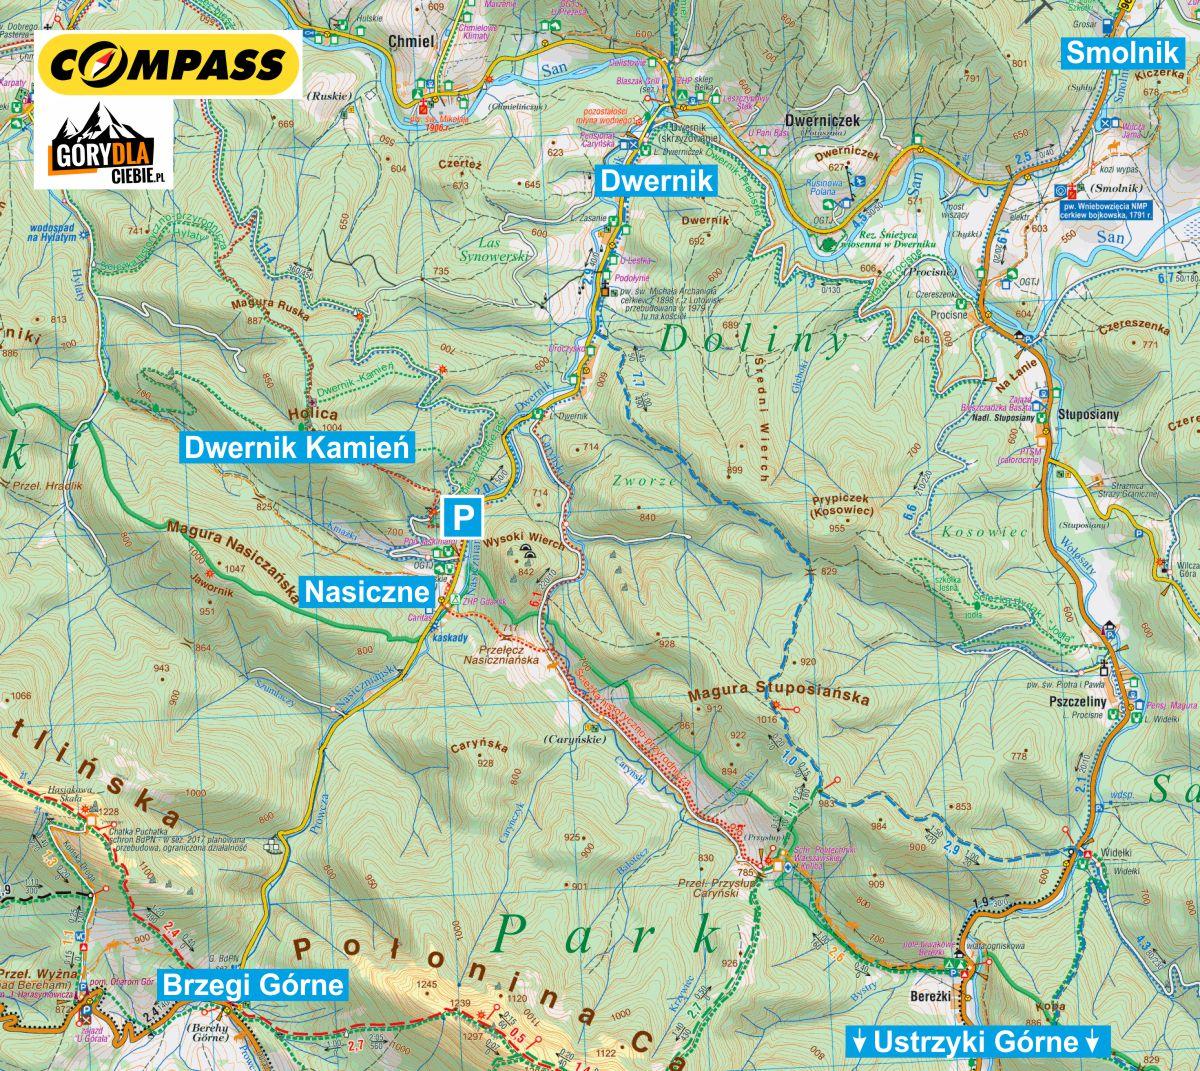 Dwernik Kamień - dojazd mapa